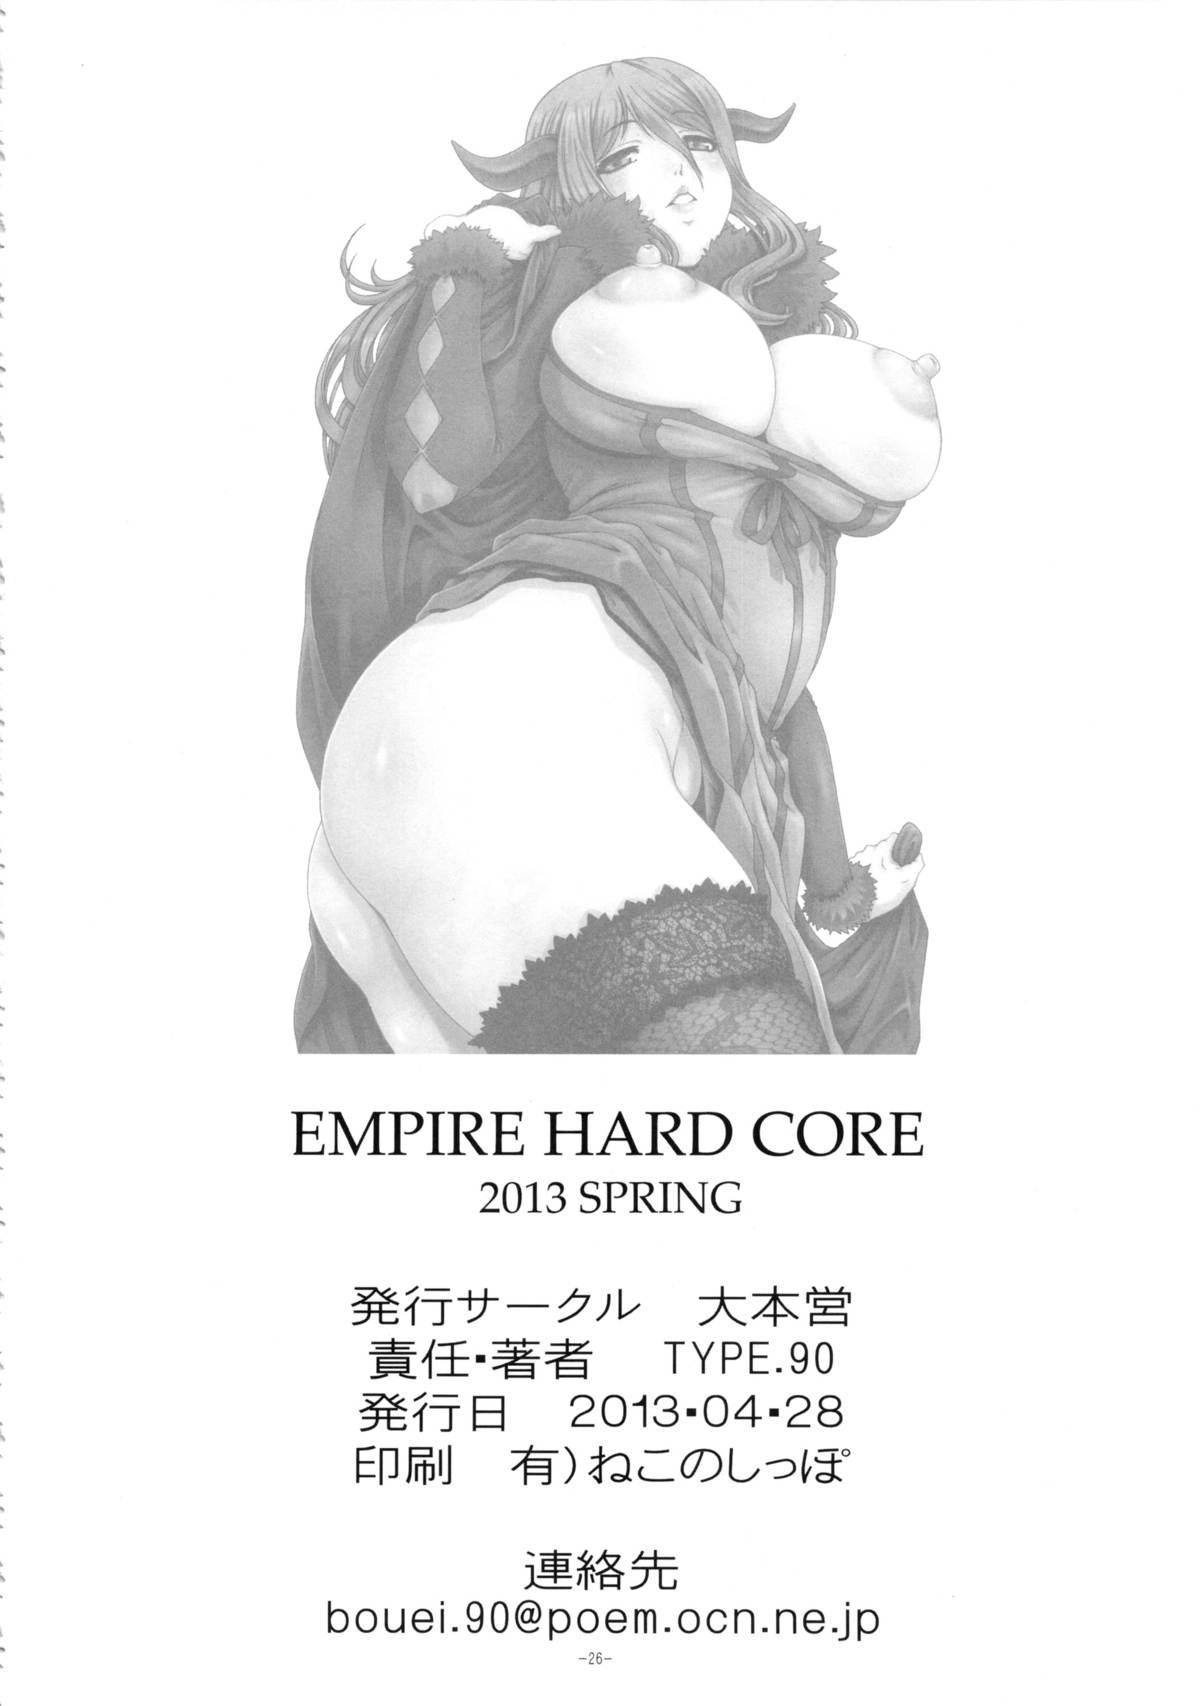 EMPIRE HARD CORE 2013 SPRING 24